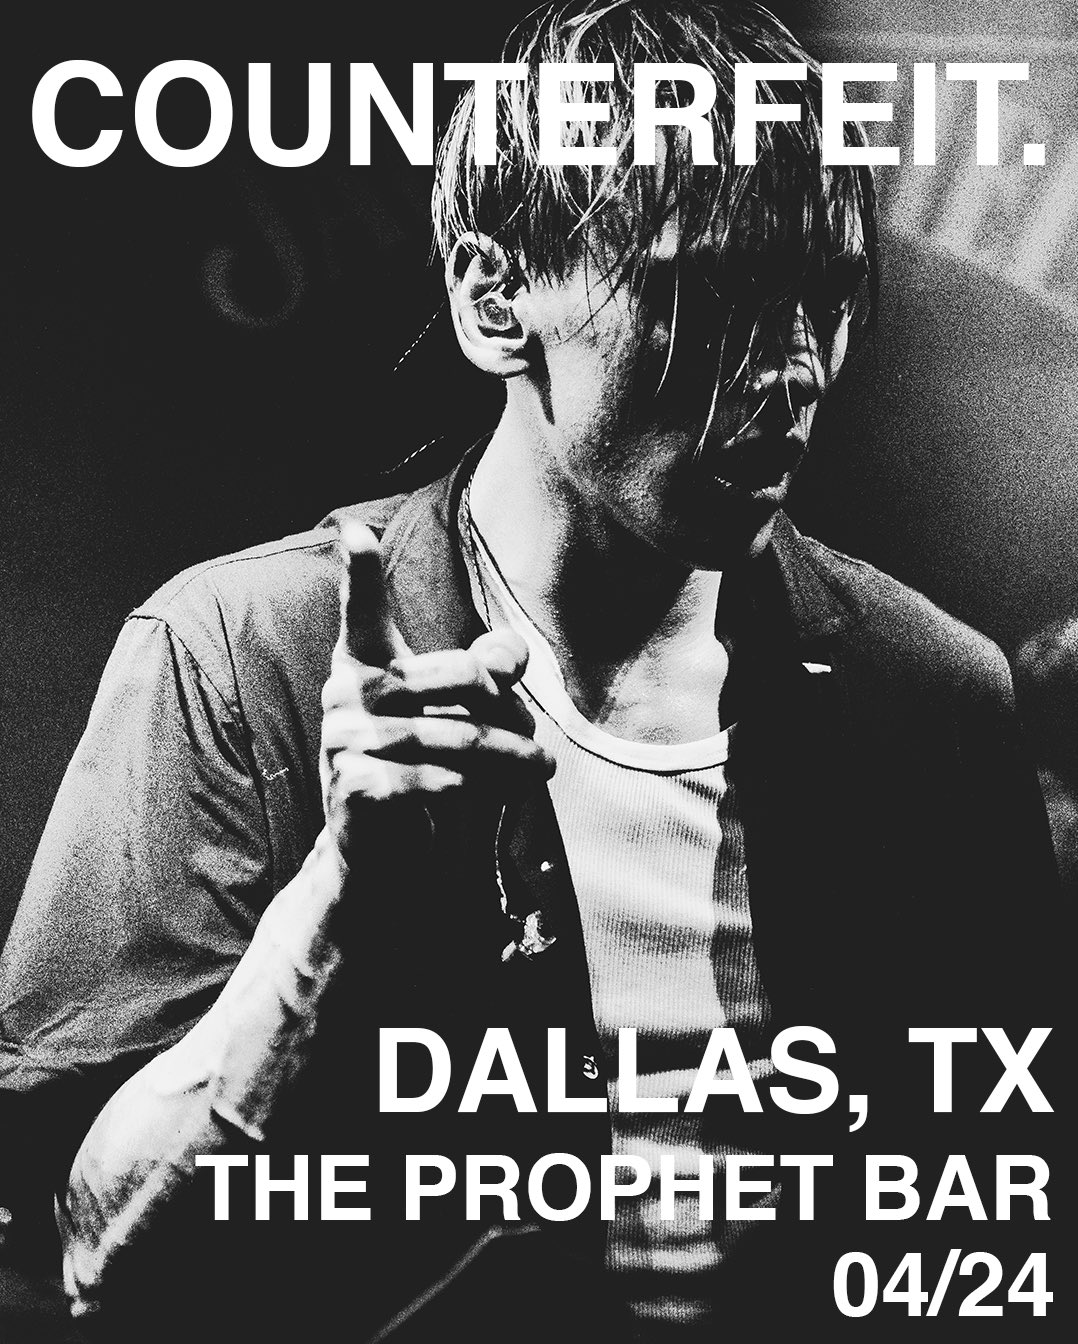 Dallas tonight. God help us all. https://t.co/jDoKrkZHBe